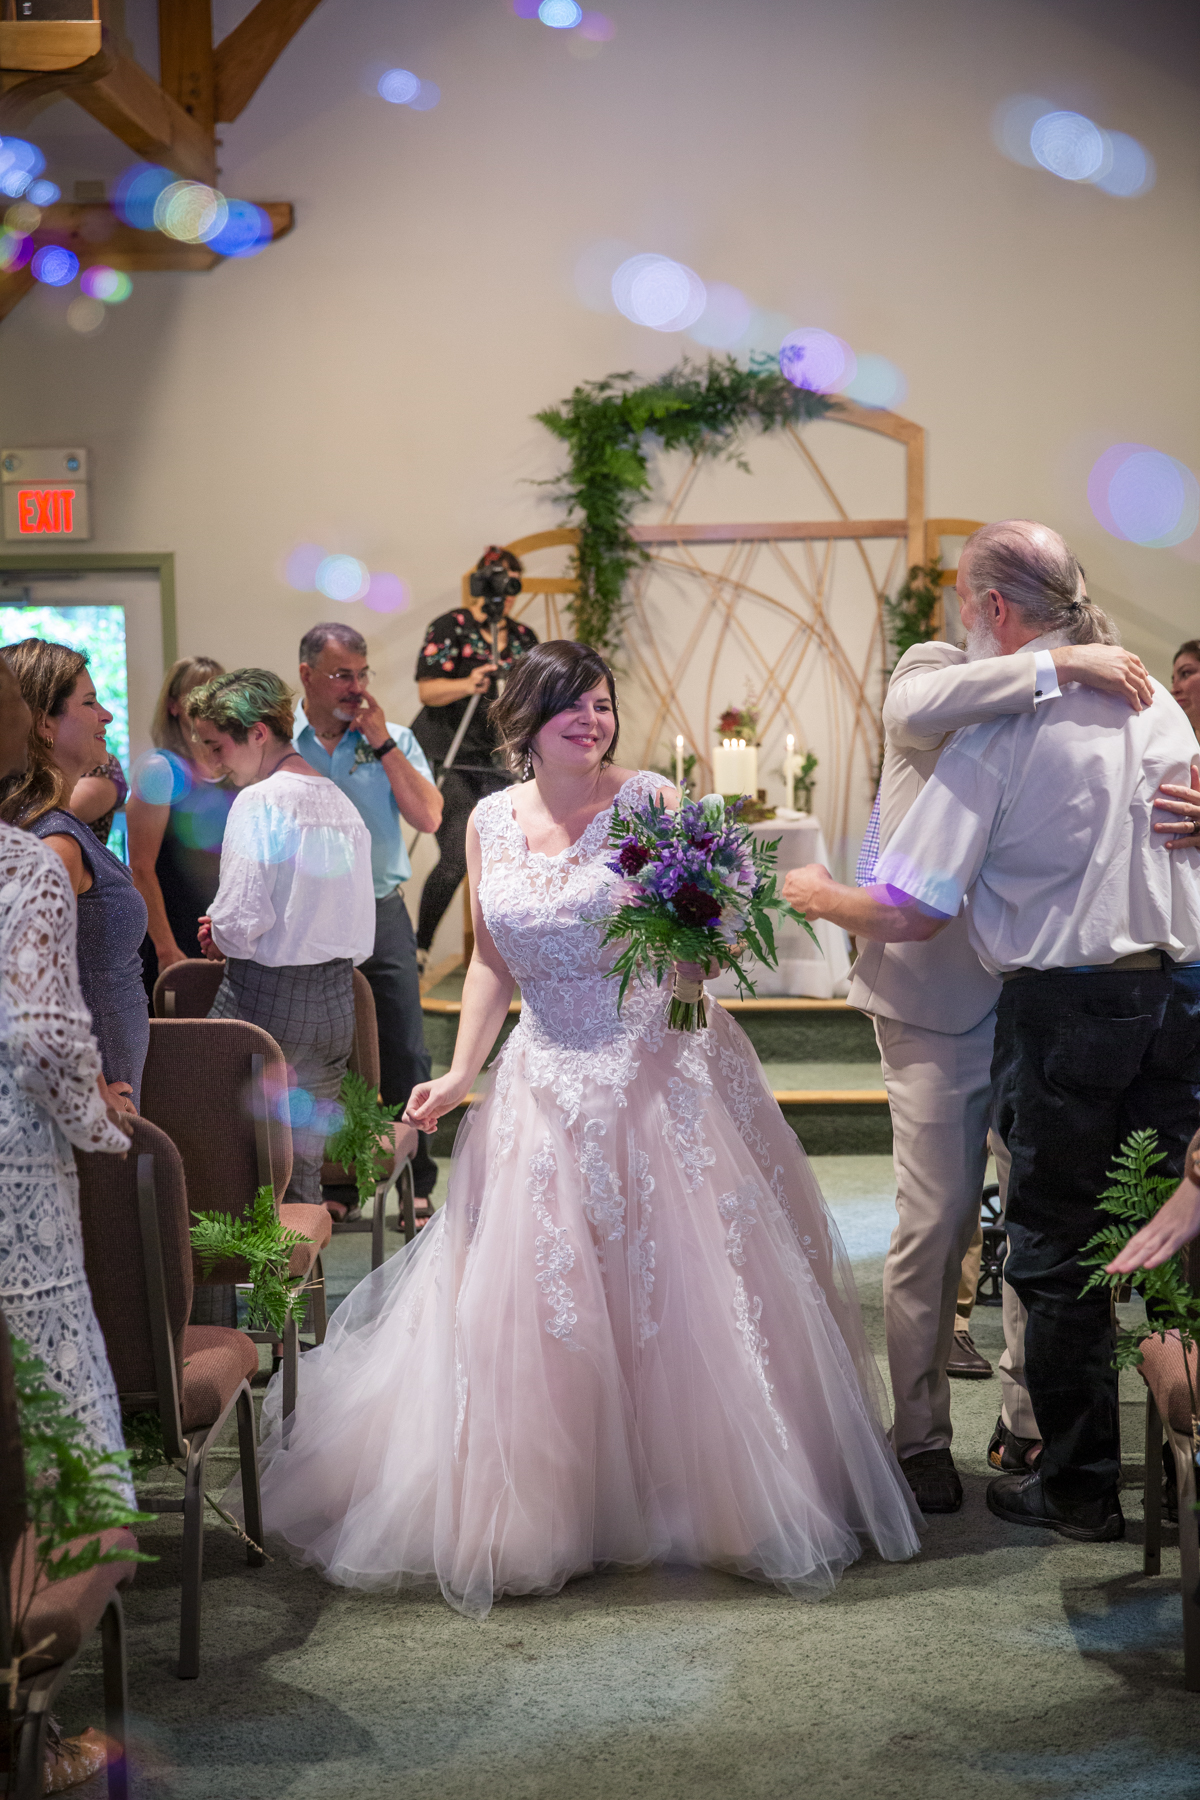 Avyanna and Phoenix Wedding- Photos by Studio Misha_BLOG-230.jpg